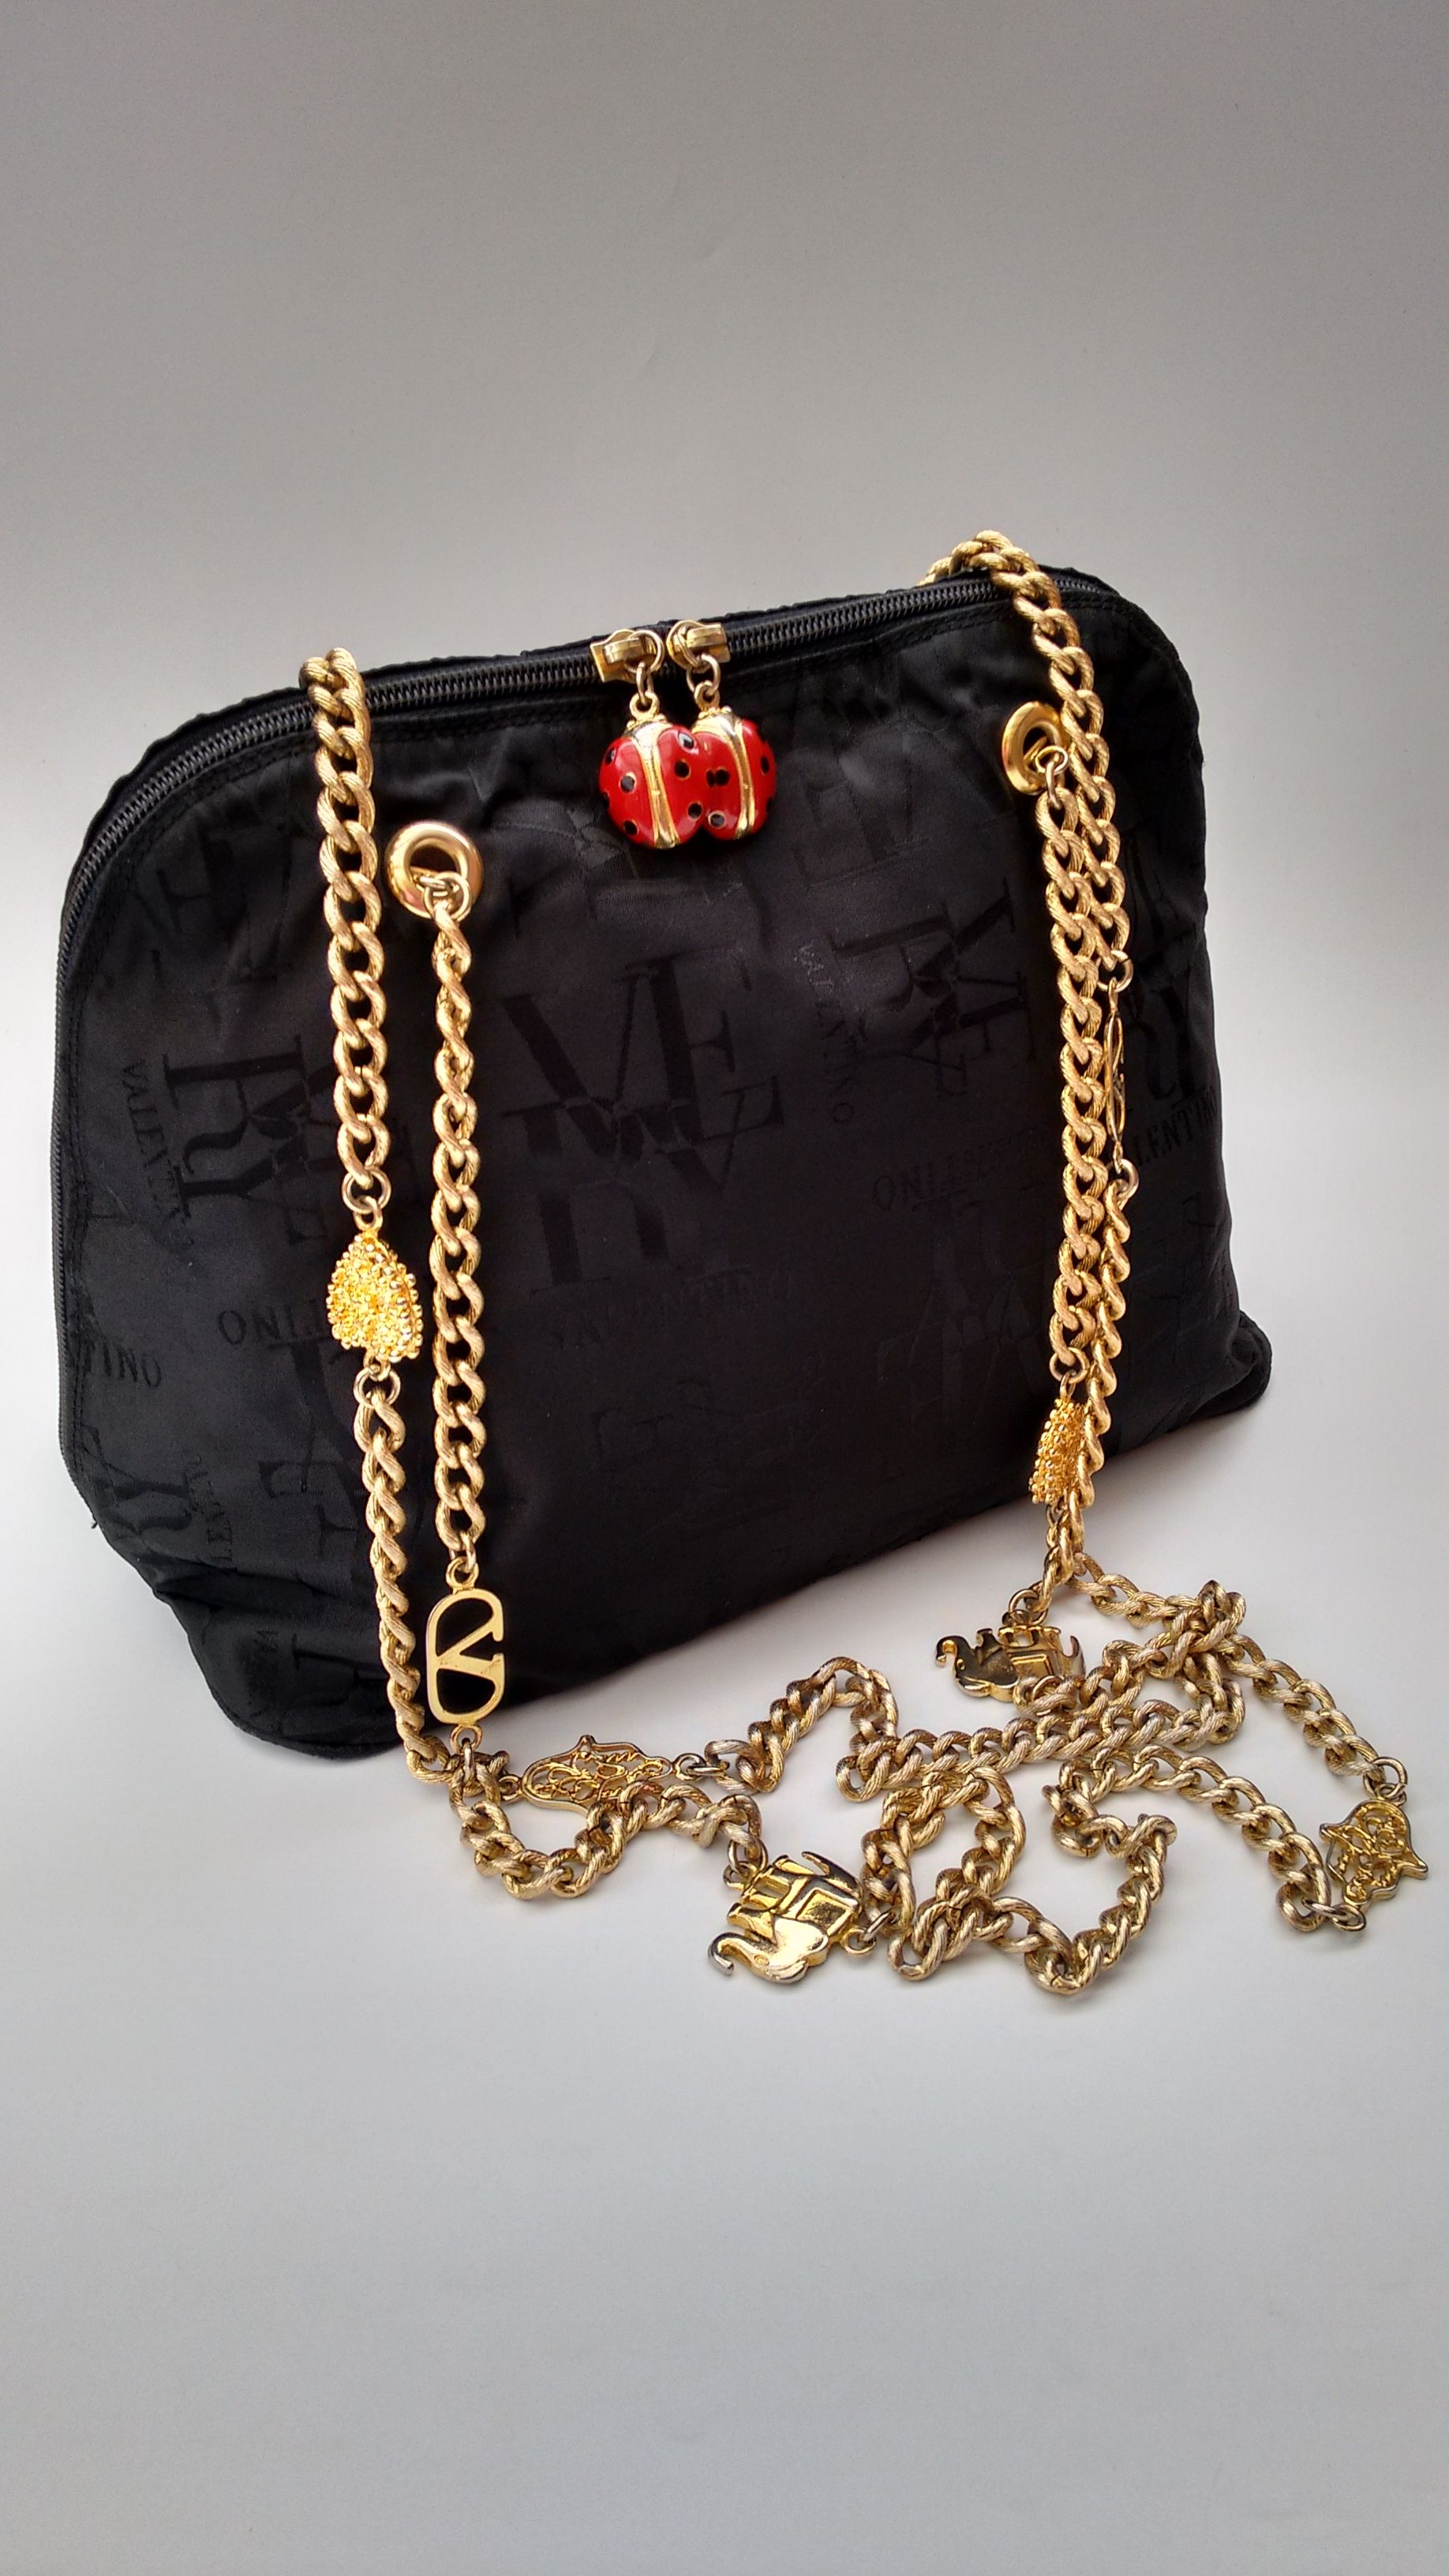 Korea Sheepskin Handbag Genuine Lambskin Leather Women Cossbody Bag rose